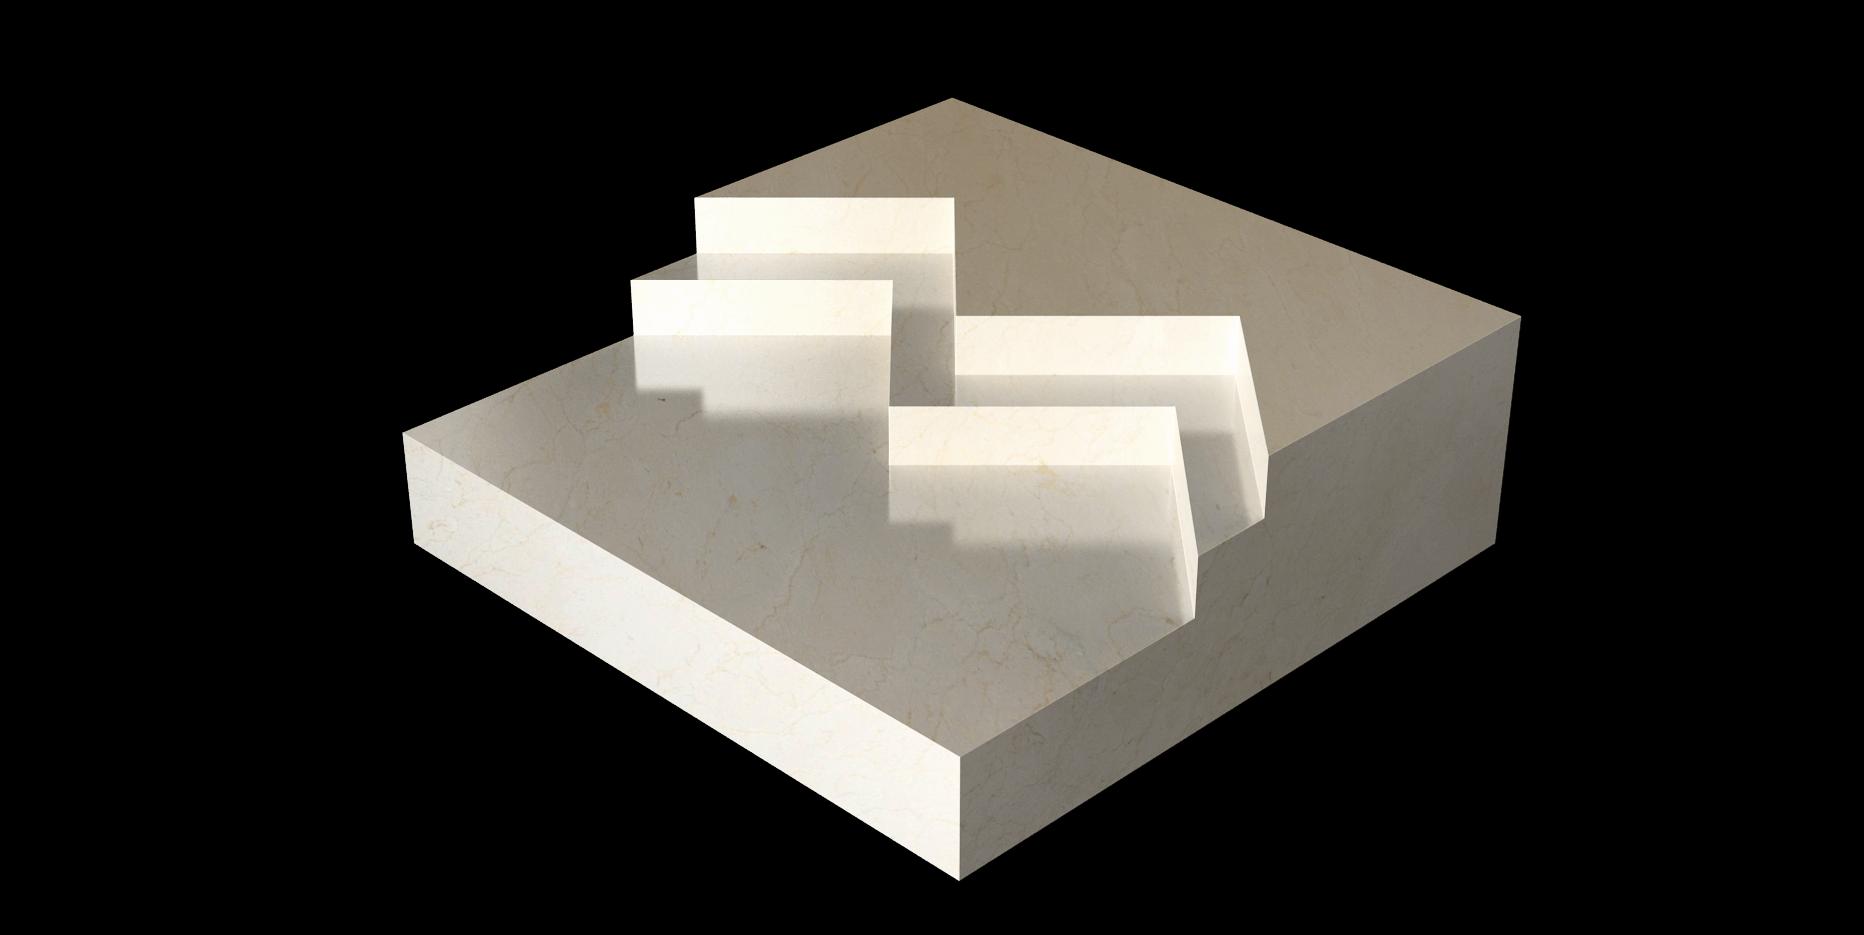 Crema Marfil фото 2 — камень от Bevers Marmyr